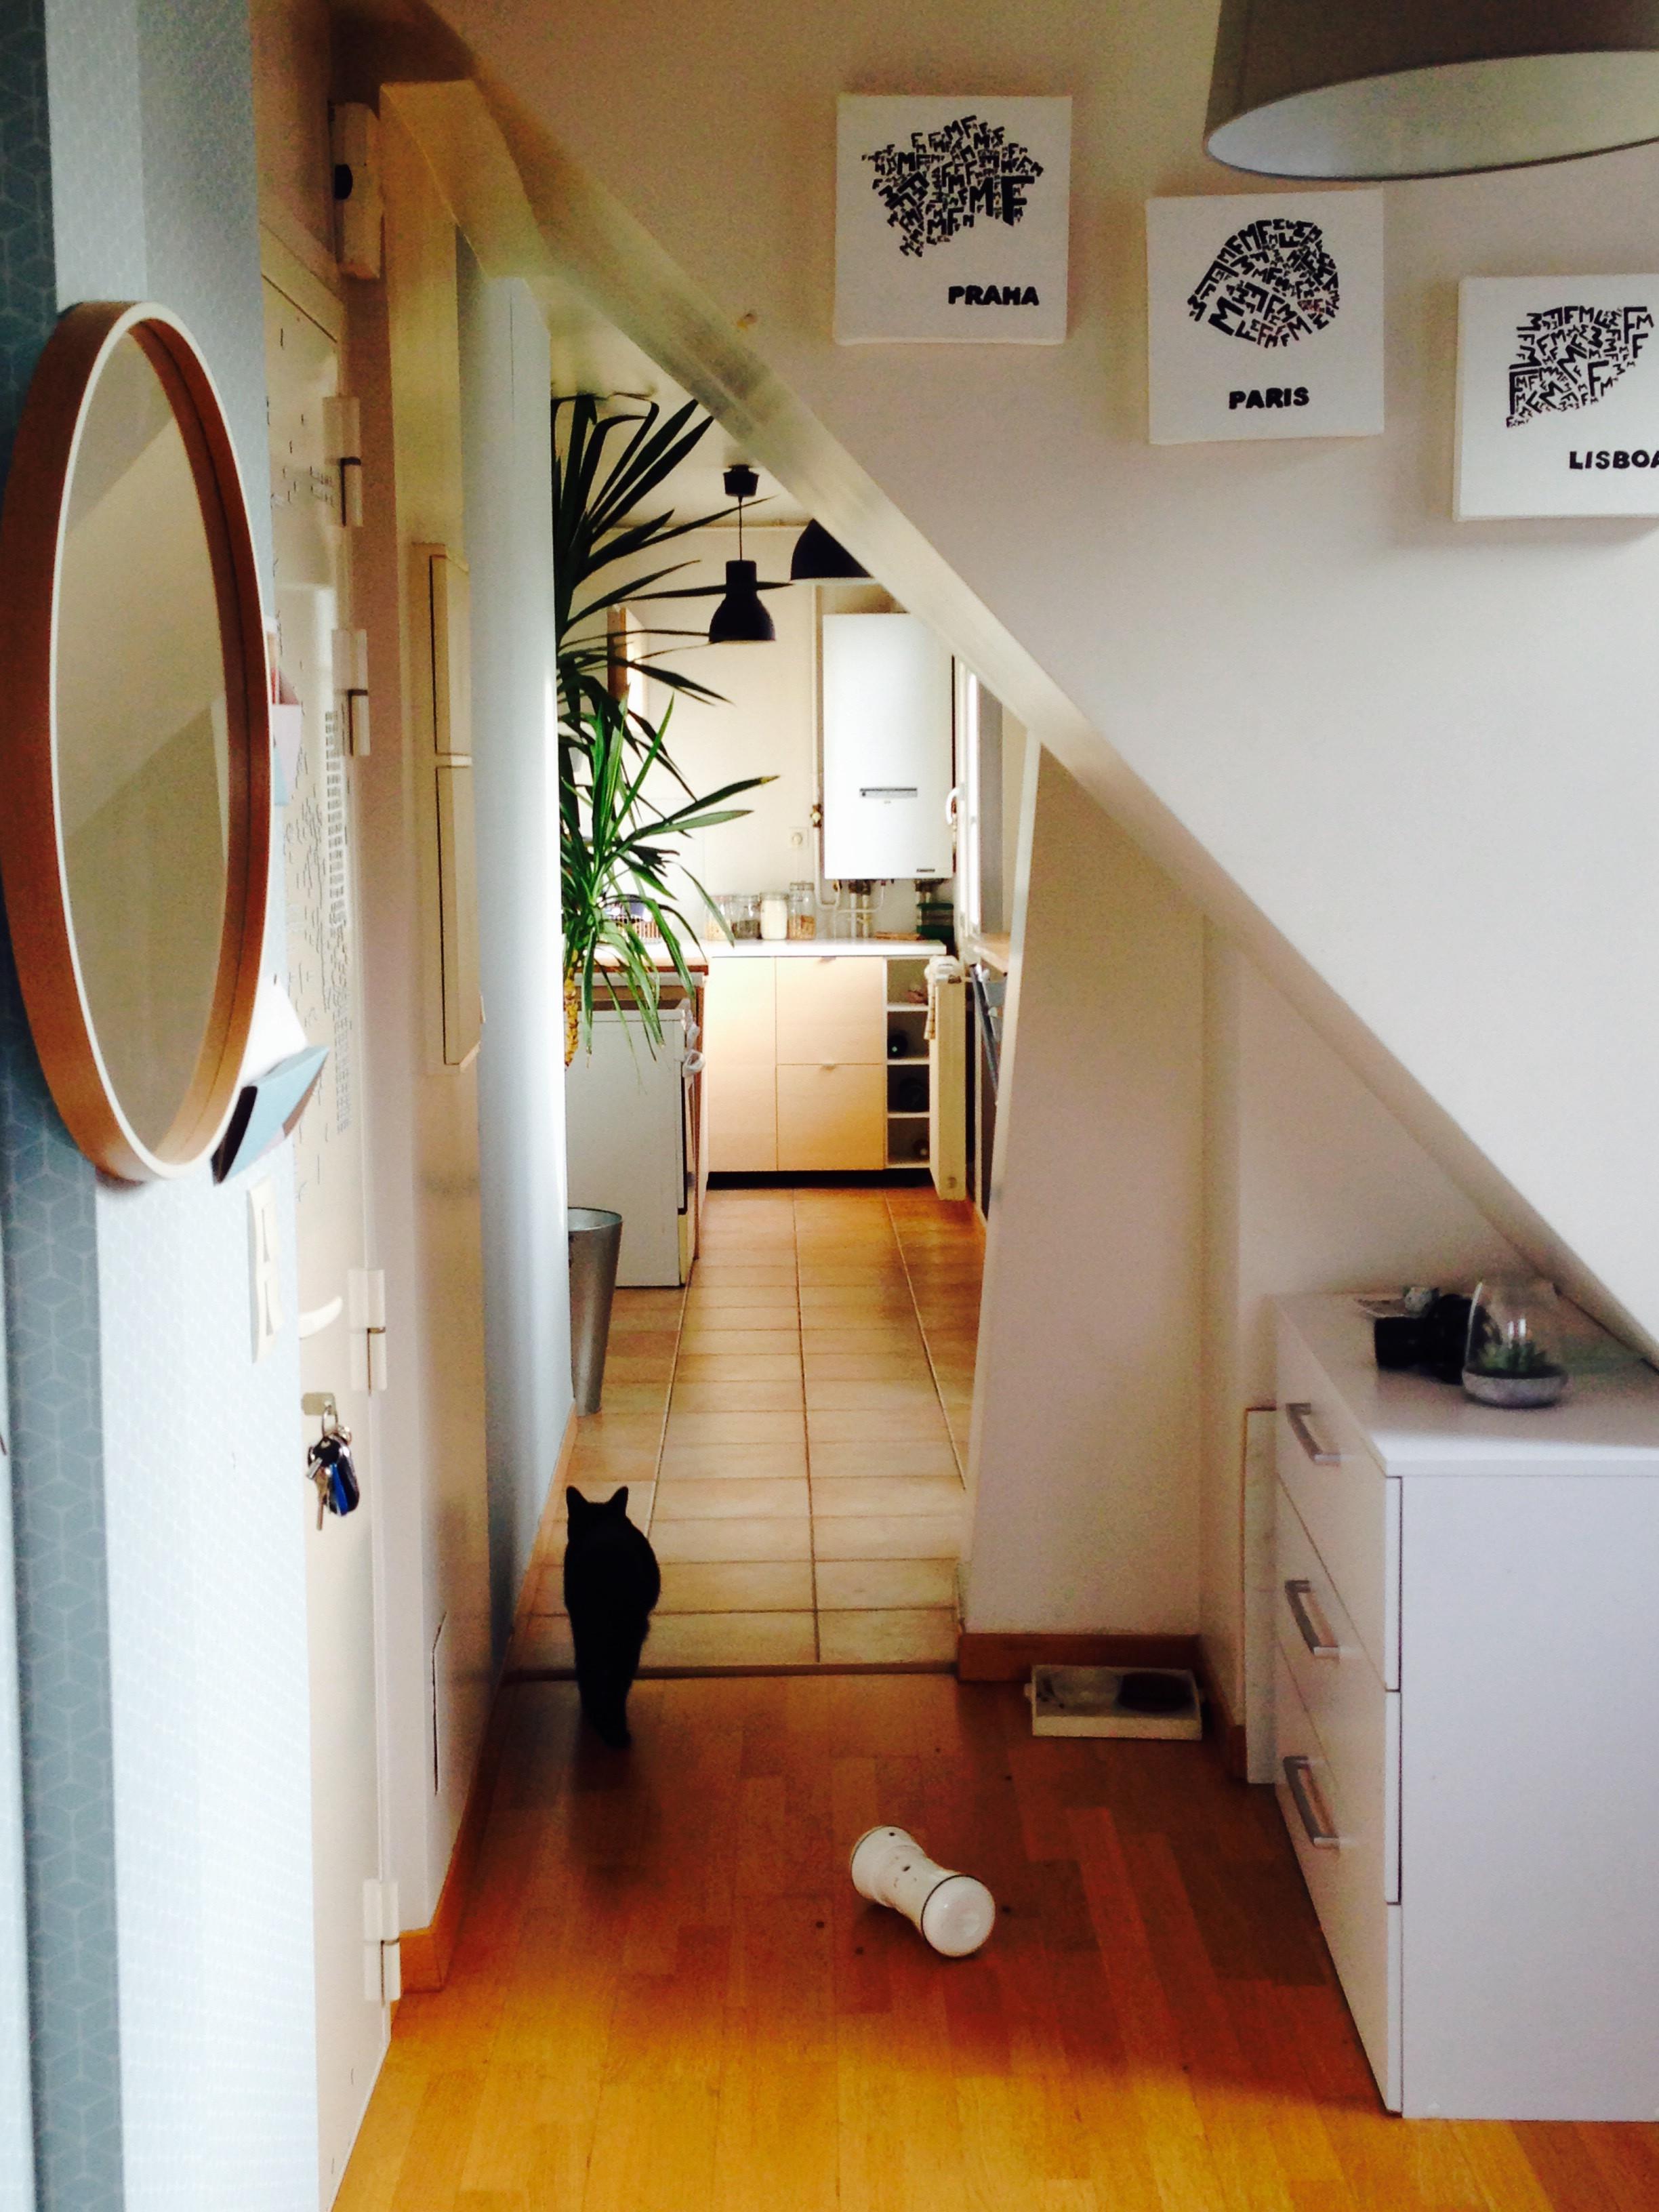 european hardwood flooring ottawa of appartement 70m2 au coeur de paris boligbytte inside previous next